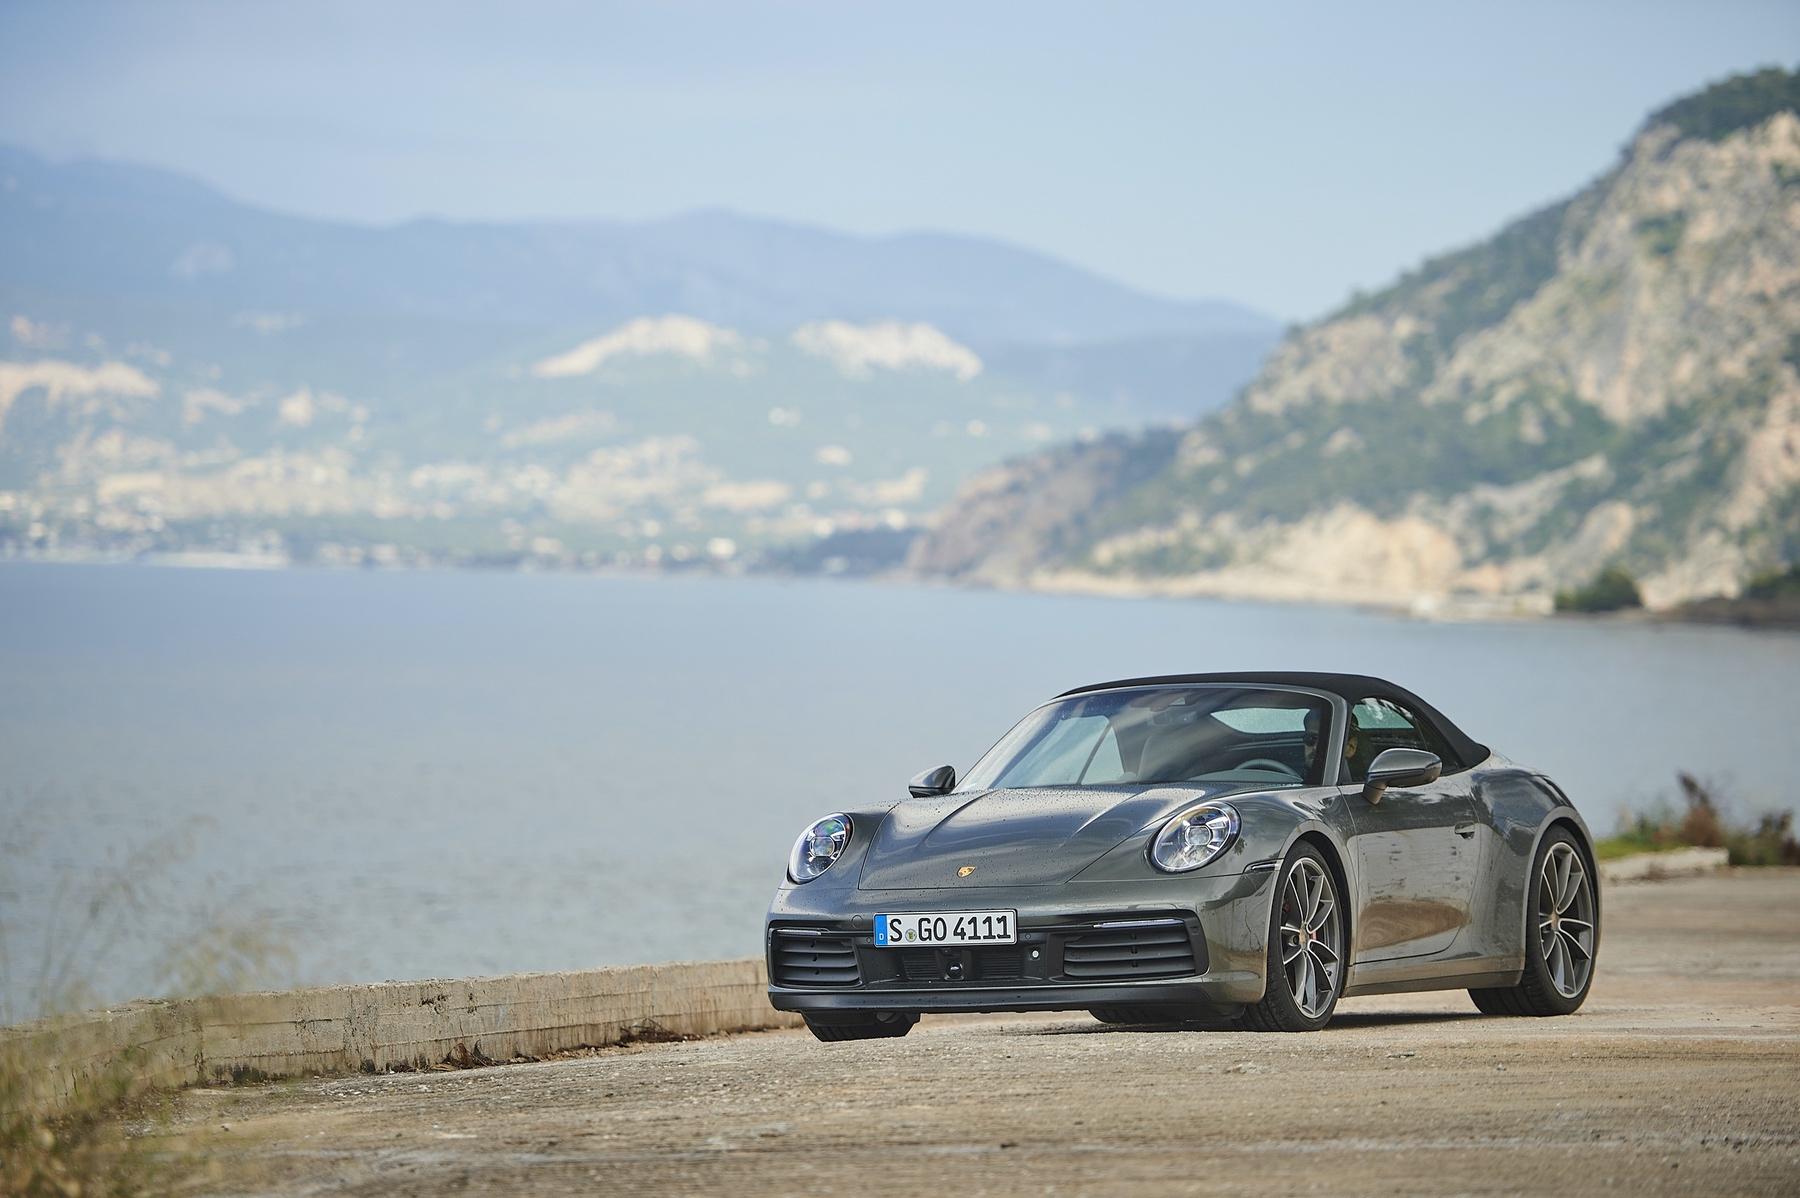 Test_Drive_Porsche_911_Athens_0034